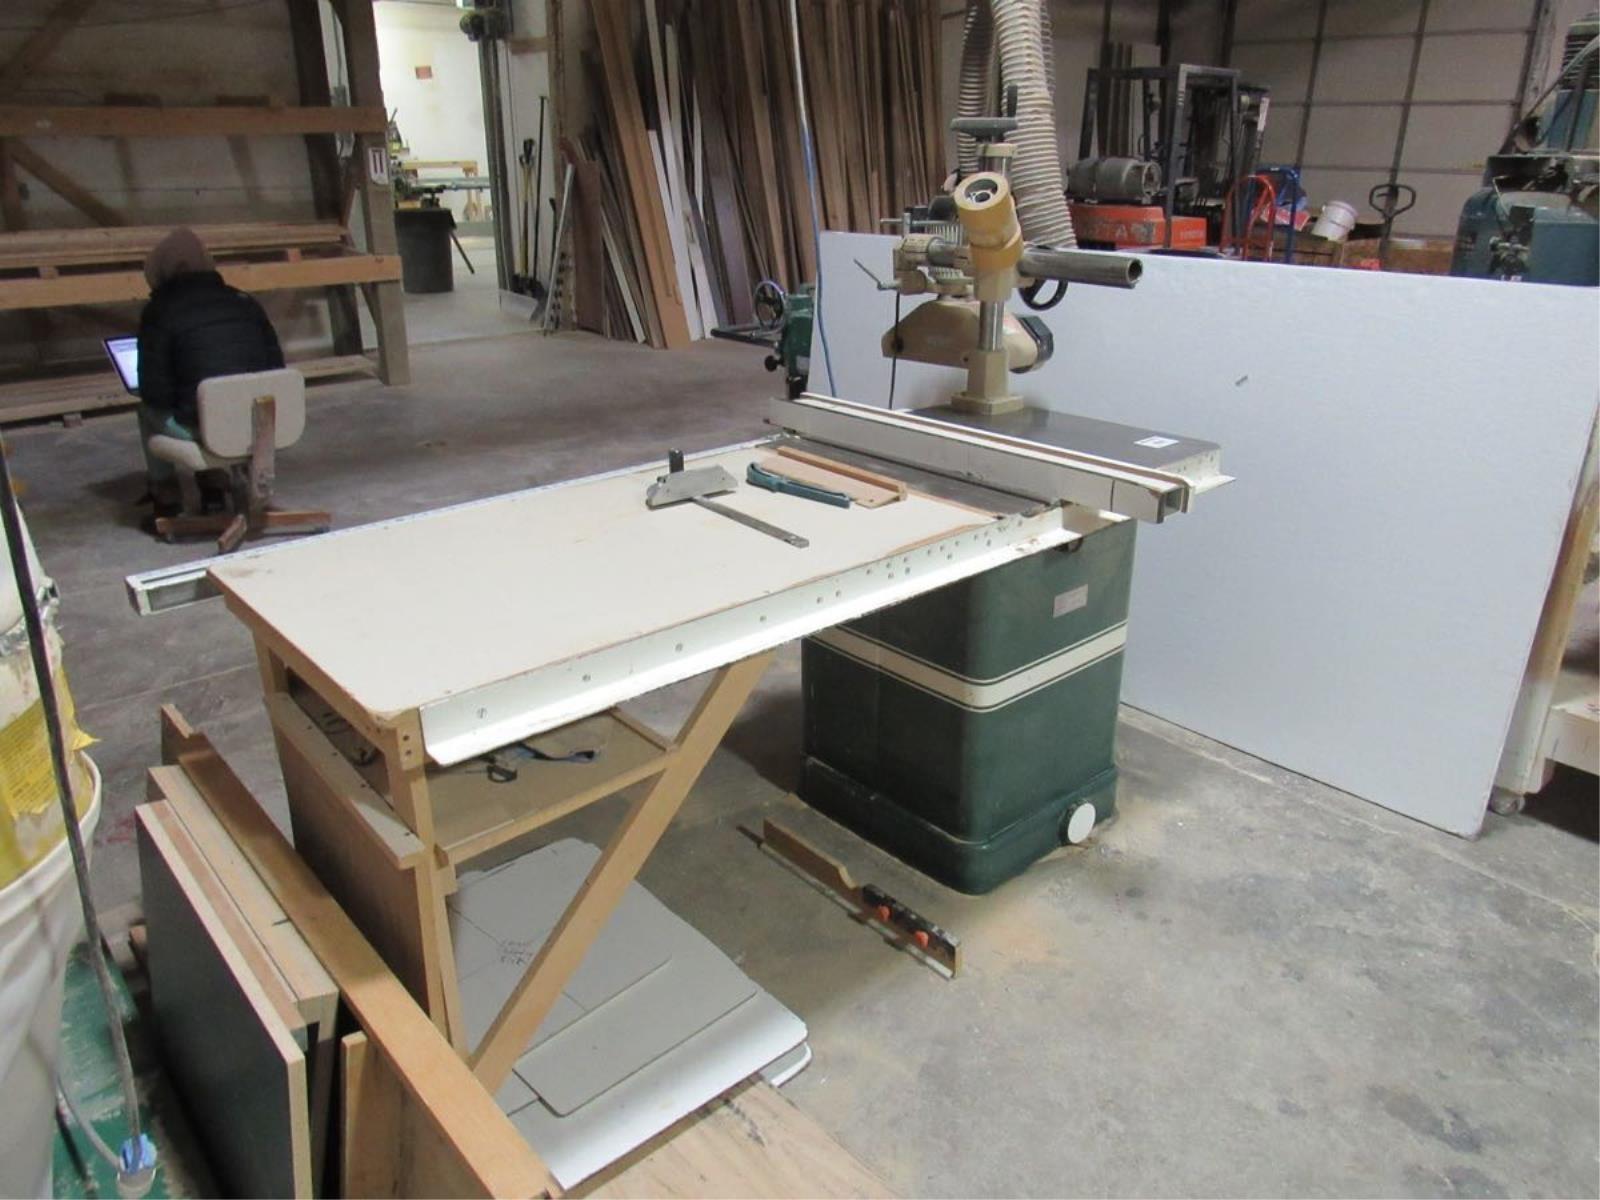 Powermatic 66 table saw w/ Belsaw   Musser Bros  Inc